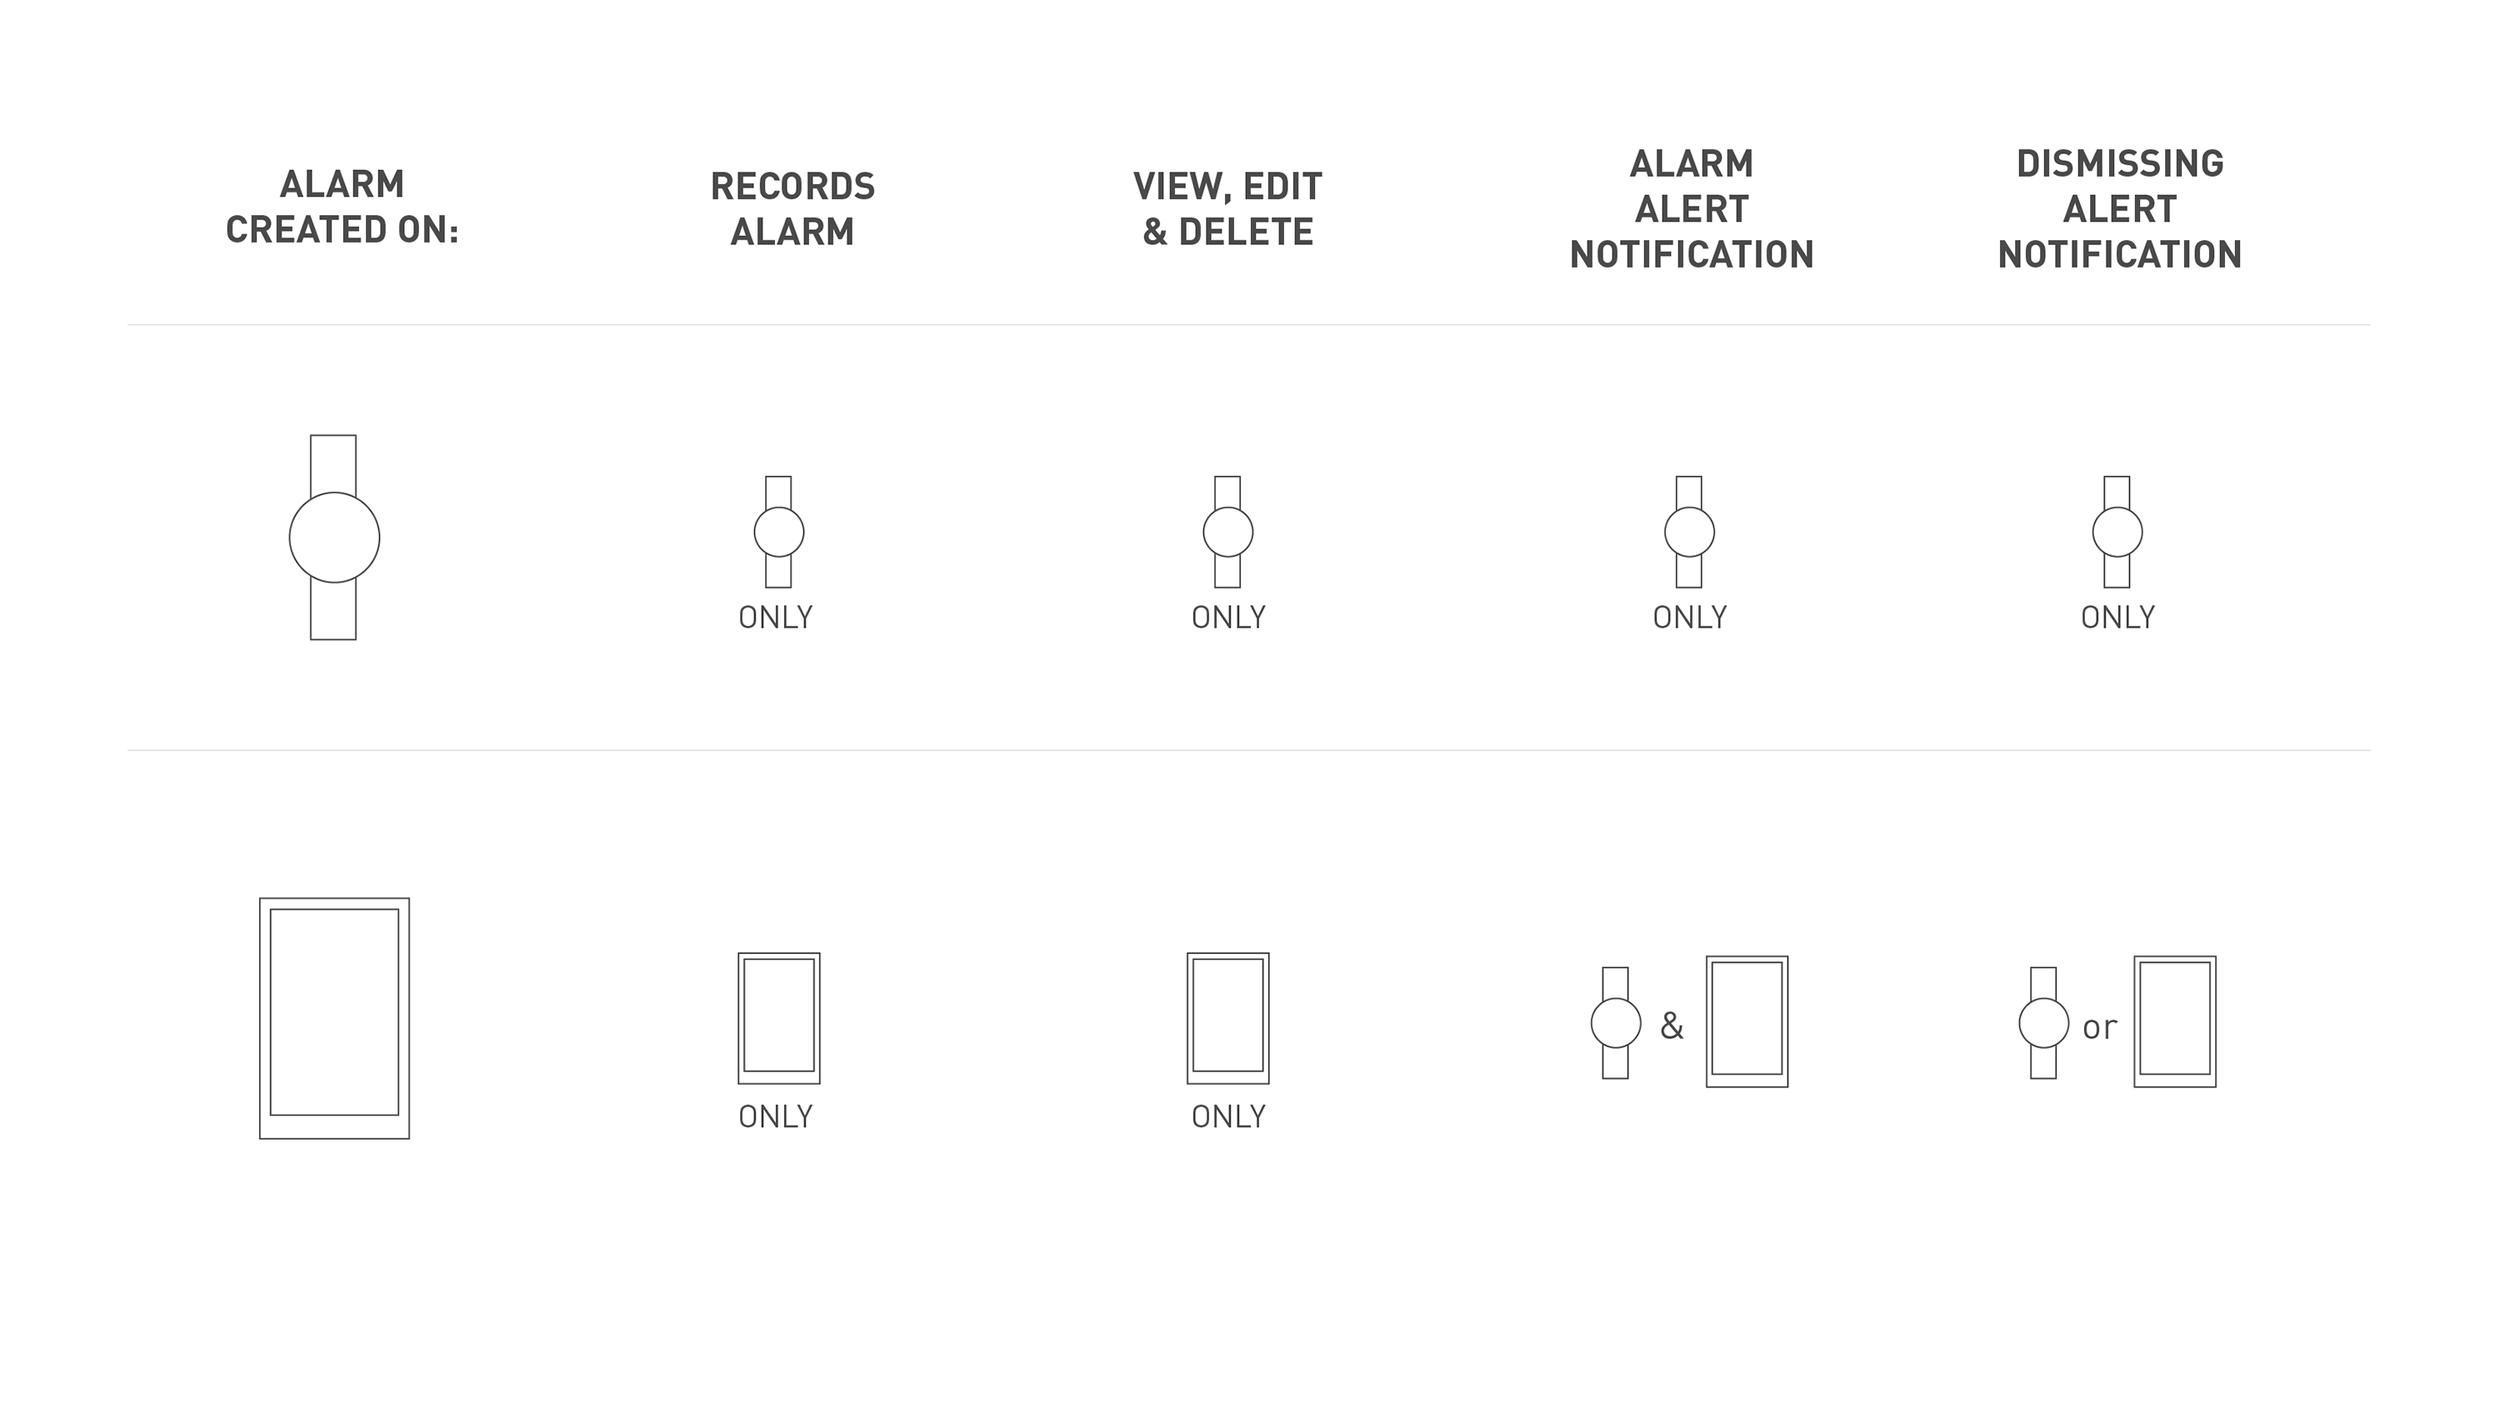 Alarm notification system